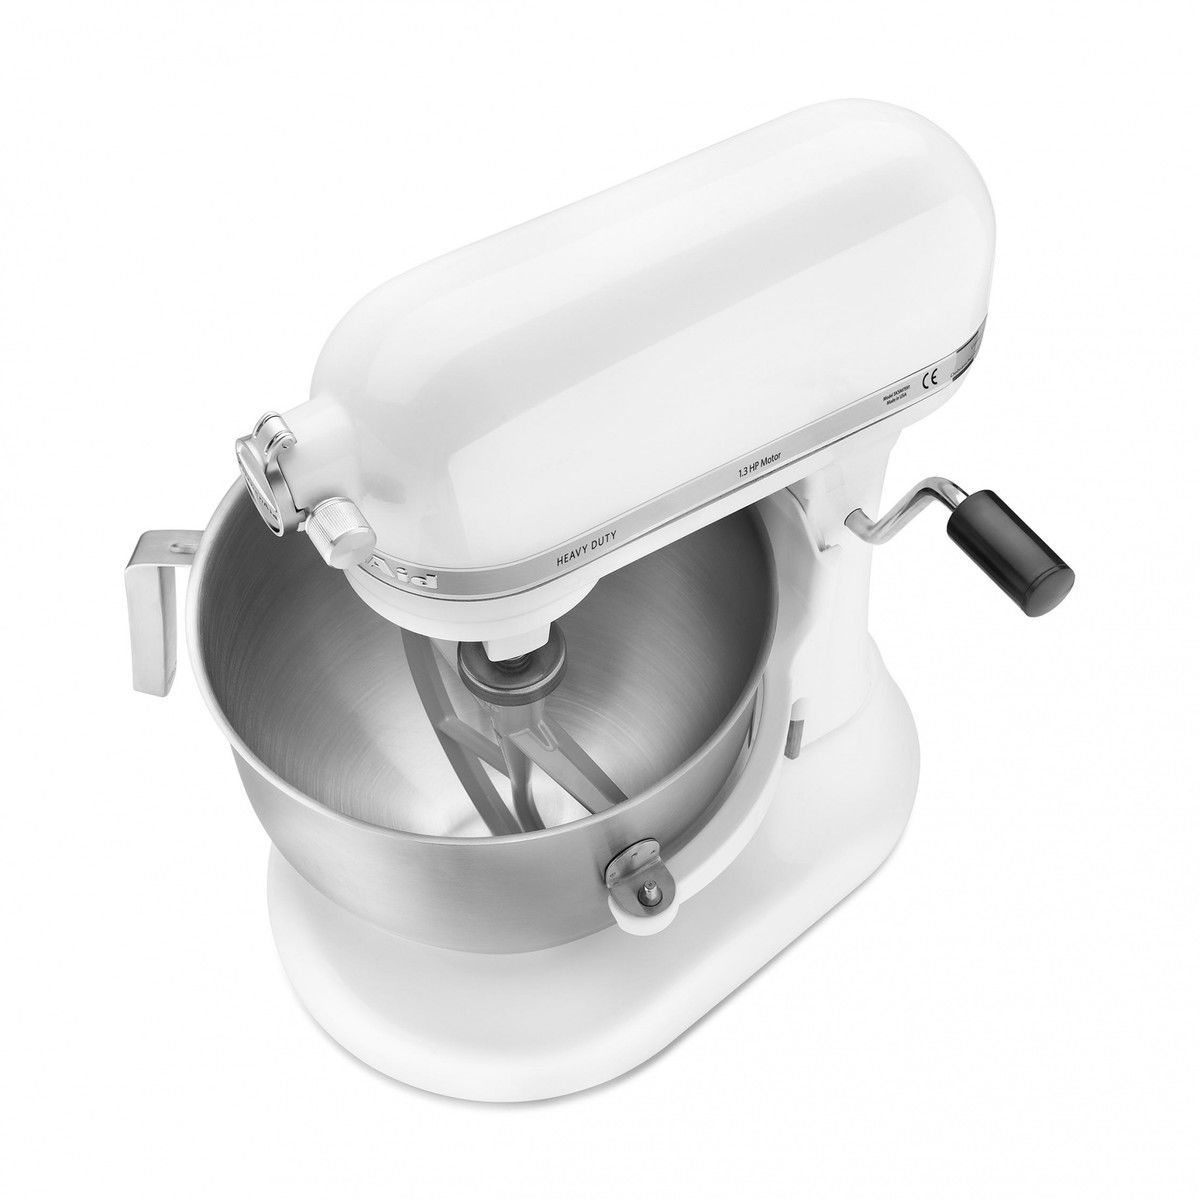 Kitchenaid Heavy Duty Food Processor